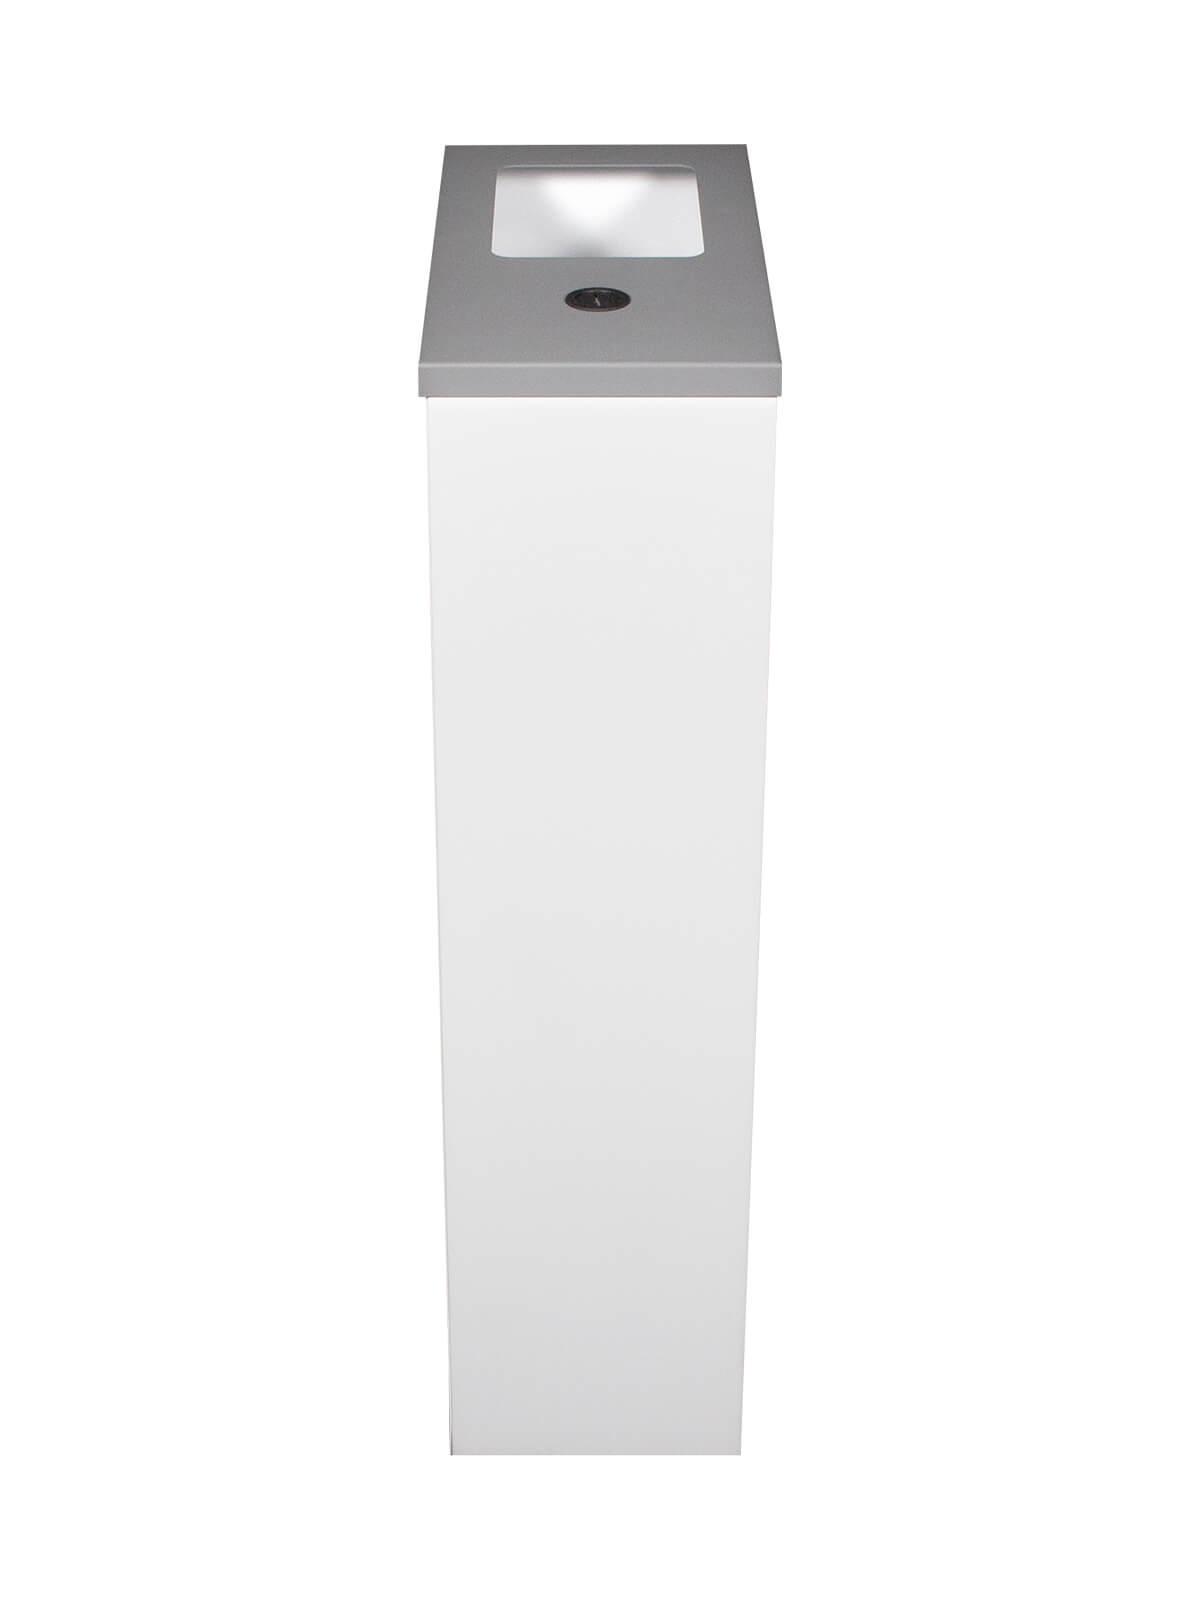 SPECTRUM WASTE & WIPES - Single - Wipes-Full - White-Sandtex Silver